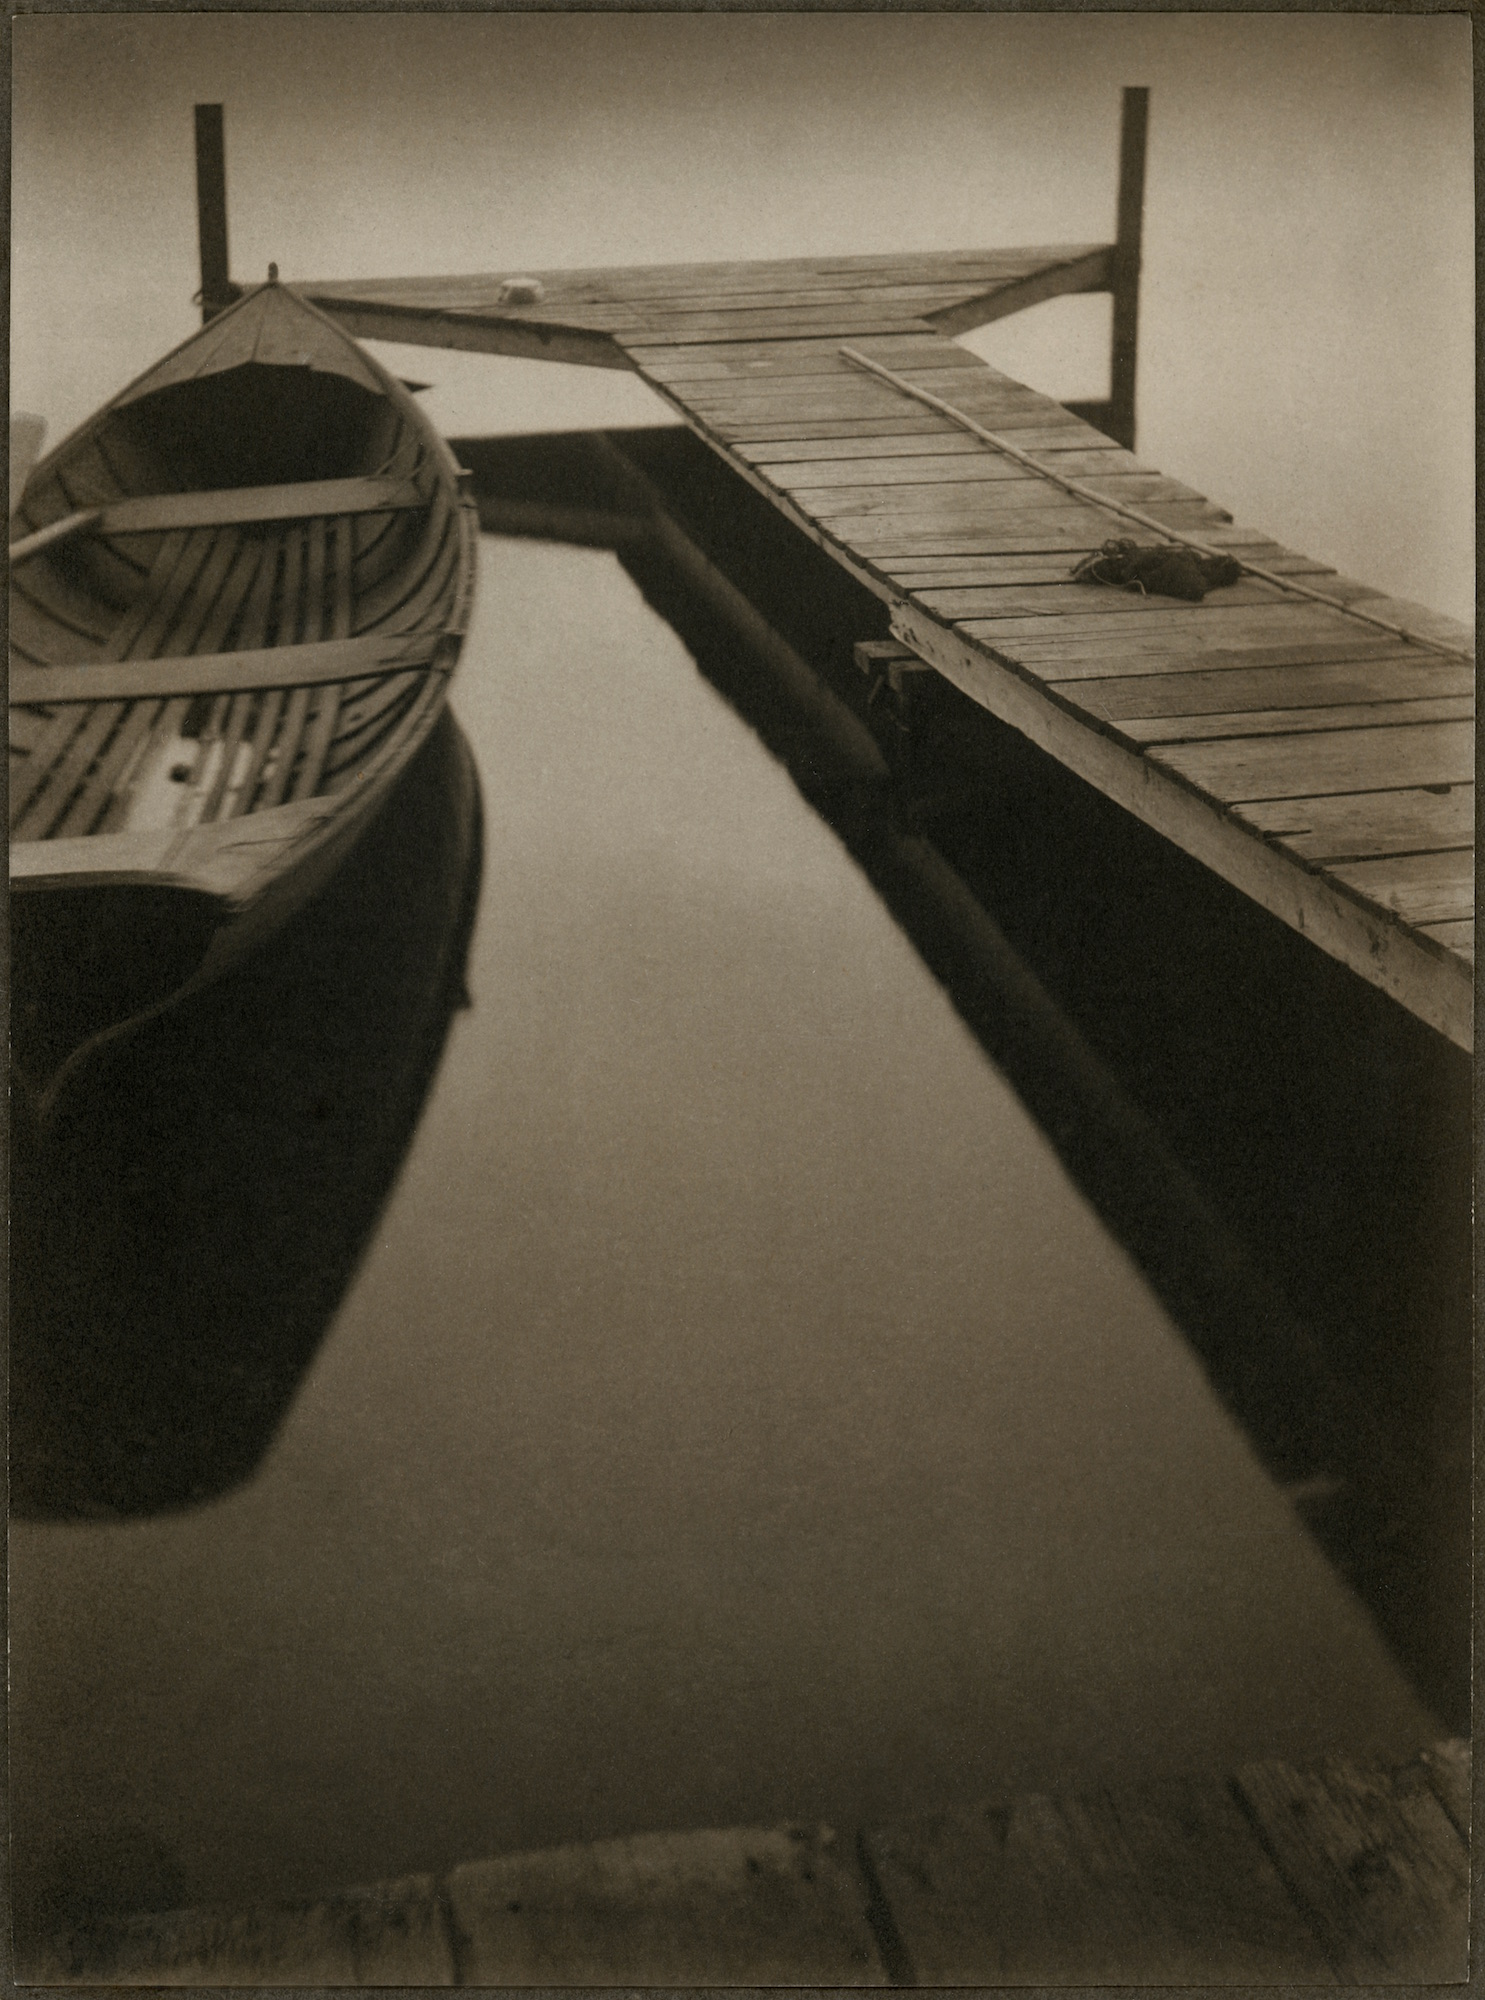 Margaret Watkins: A stég - 1922 - fotó: Margaret Watkins / Joseph Mulholland Collection, Glasgow